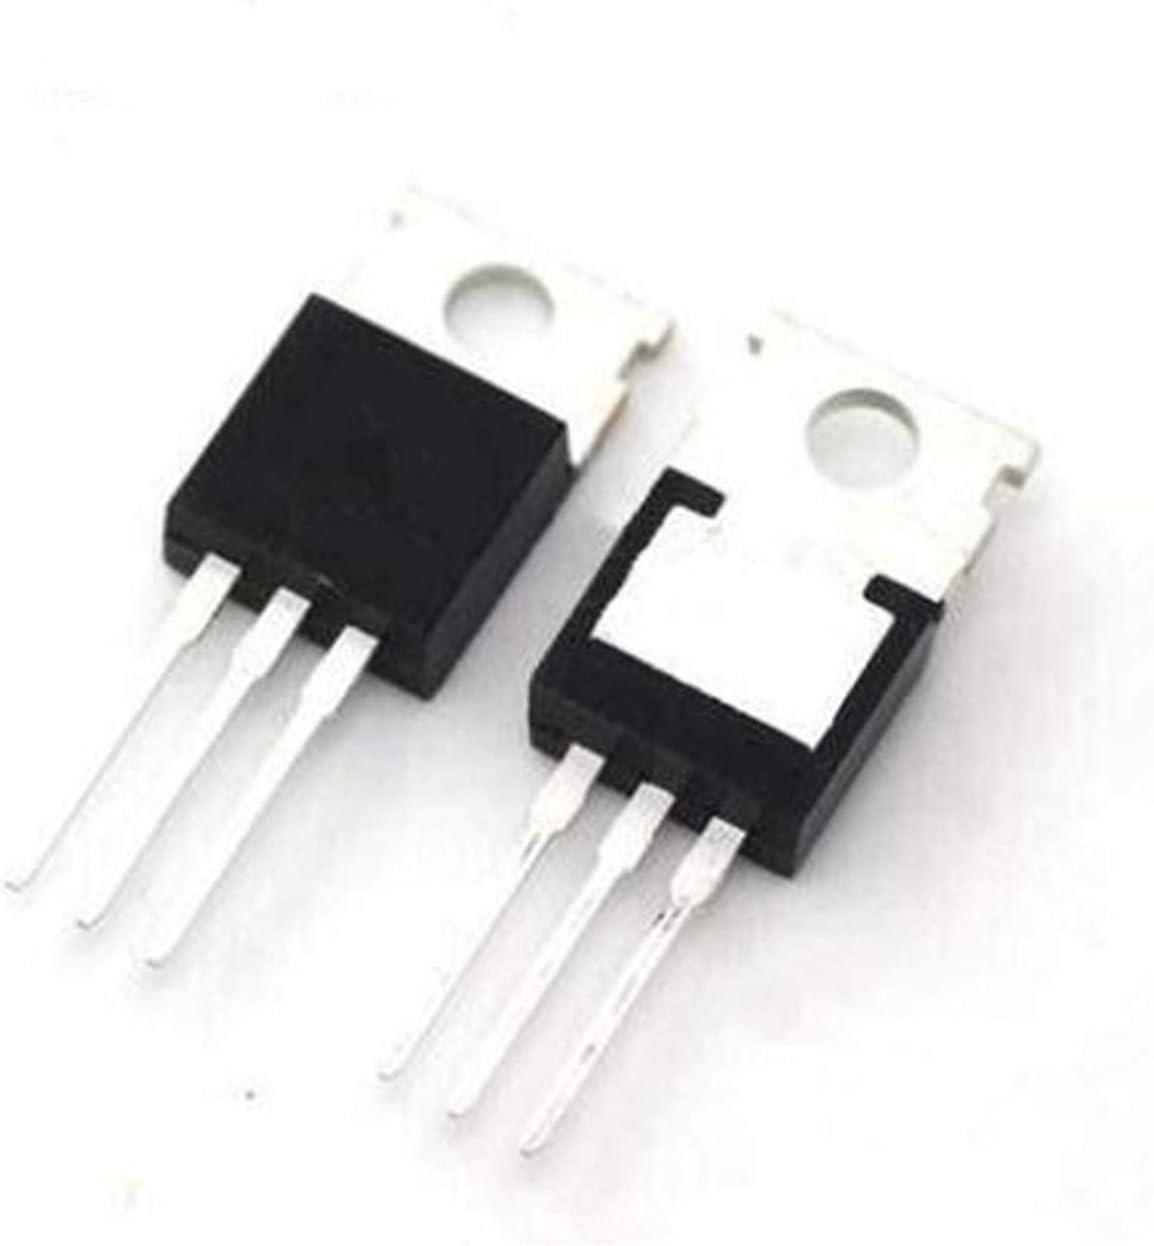 New life BAIJIAXIUSHANG-TIES Electrical Triode Transistor T IRFBC40 50PCS OFFer